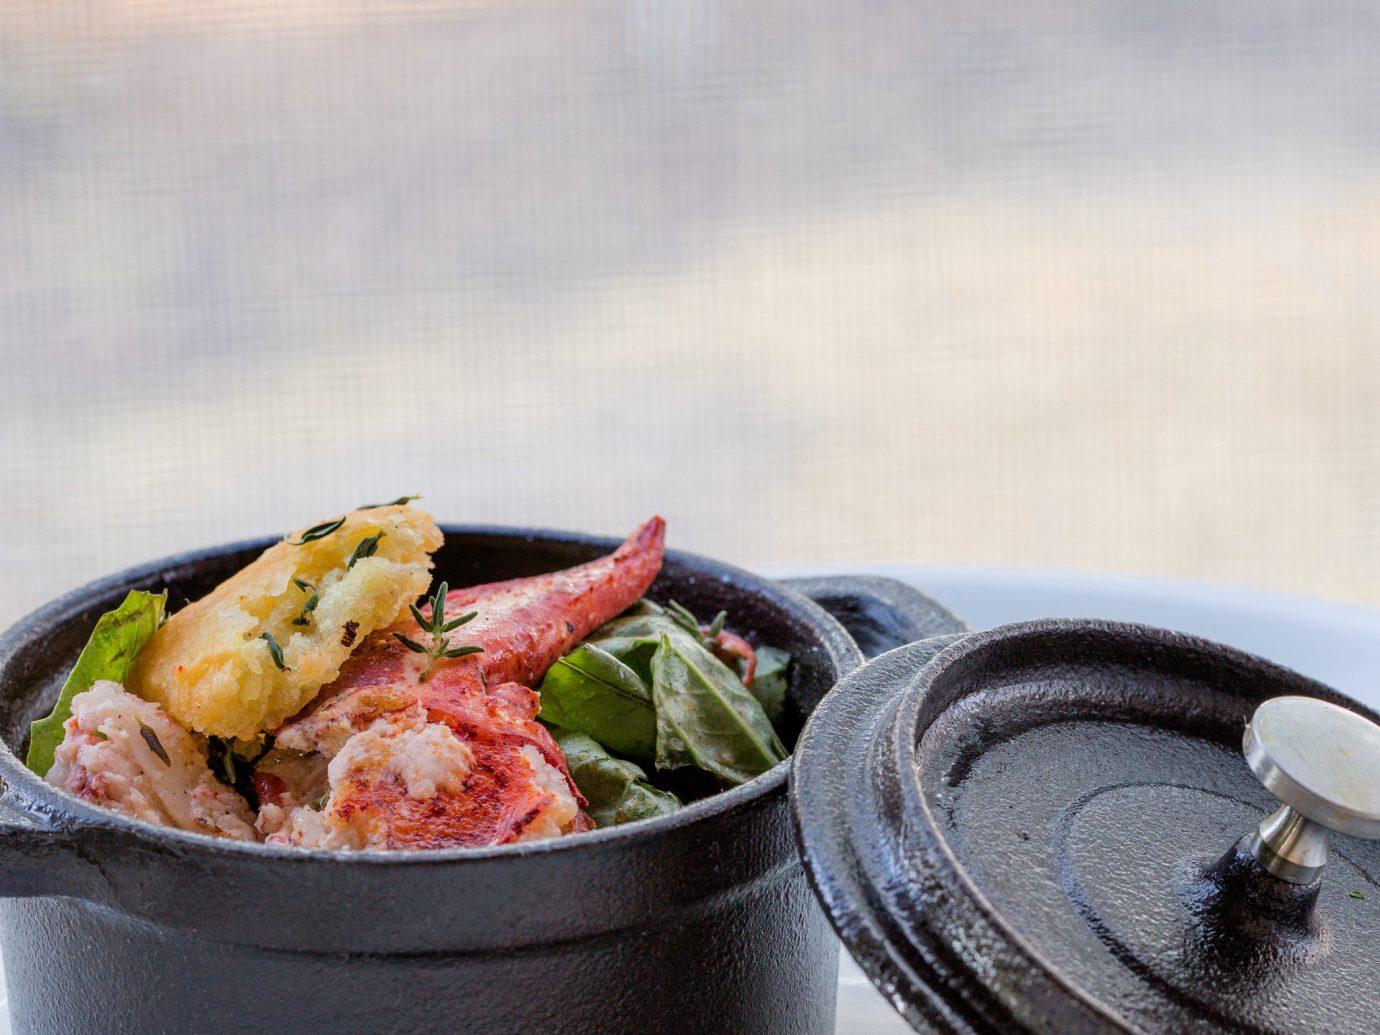 Romance Trip Ideas Weekend Getaways plate table food dish cuisine tableware cookware and bakeware meal recipe animal source foods vegetable